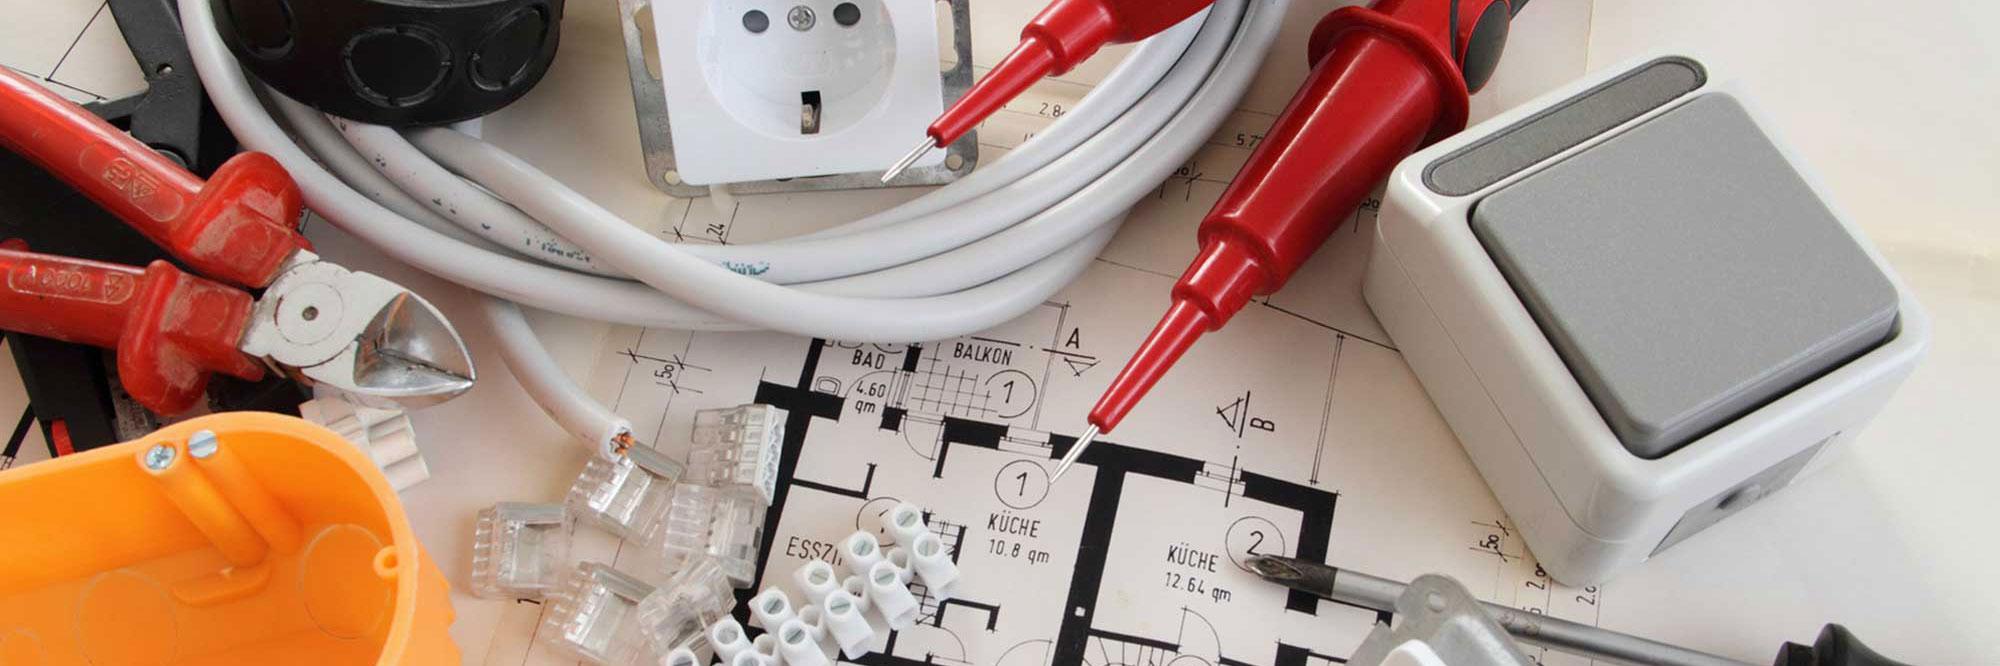 Kabel Installation